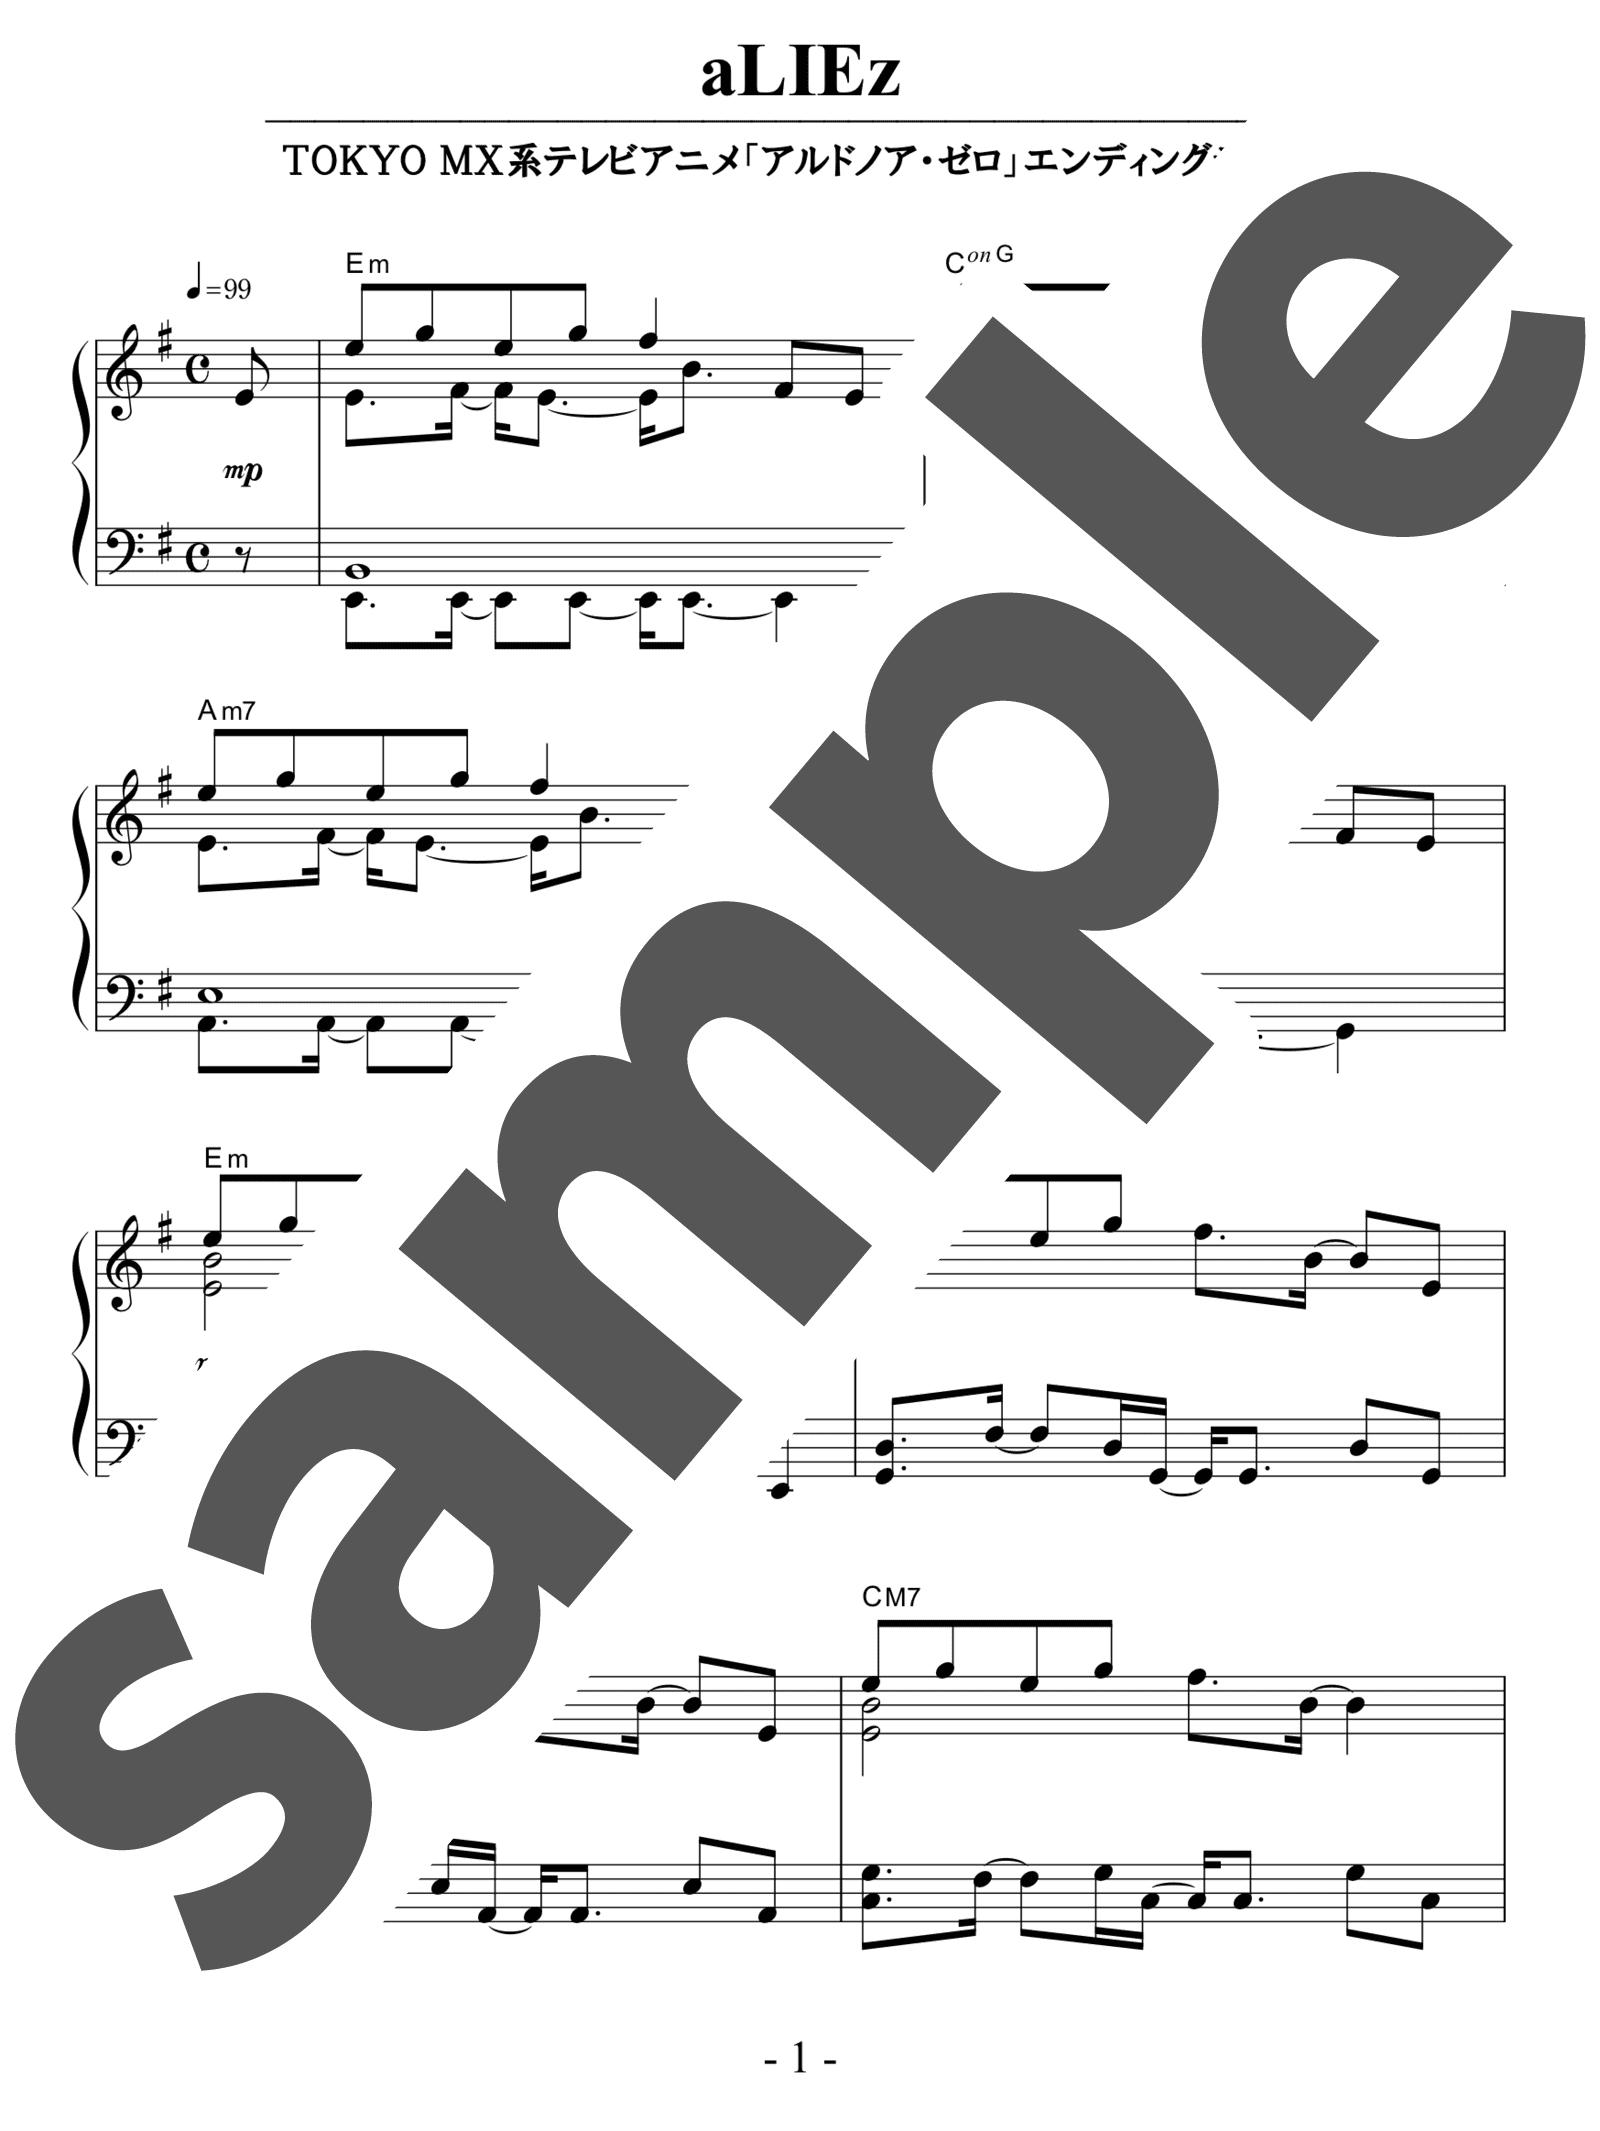 「aLIEz」のサンプル楽譜